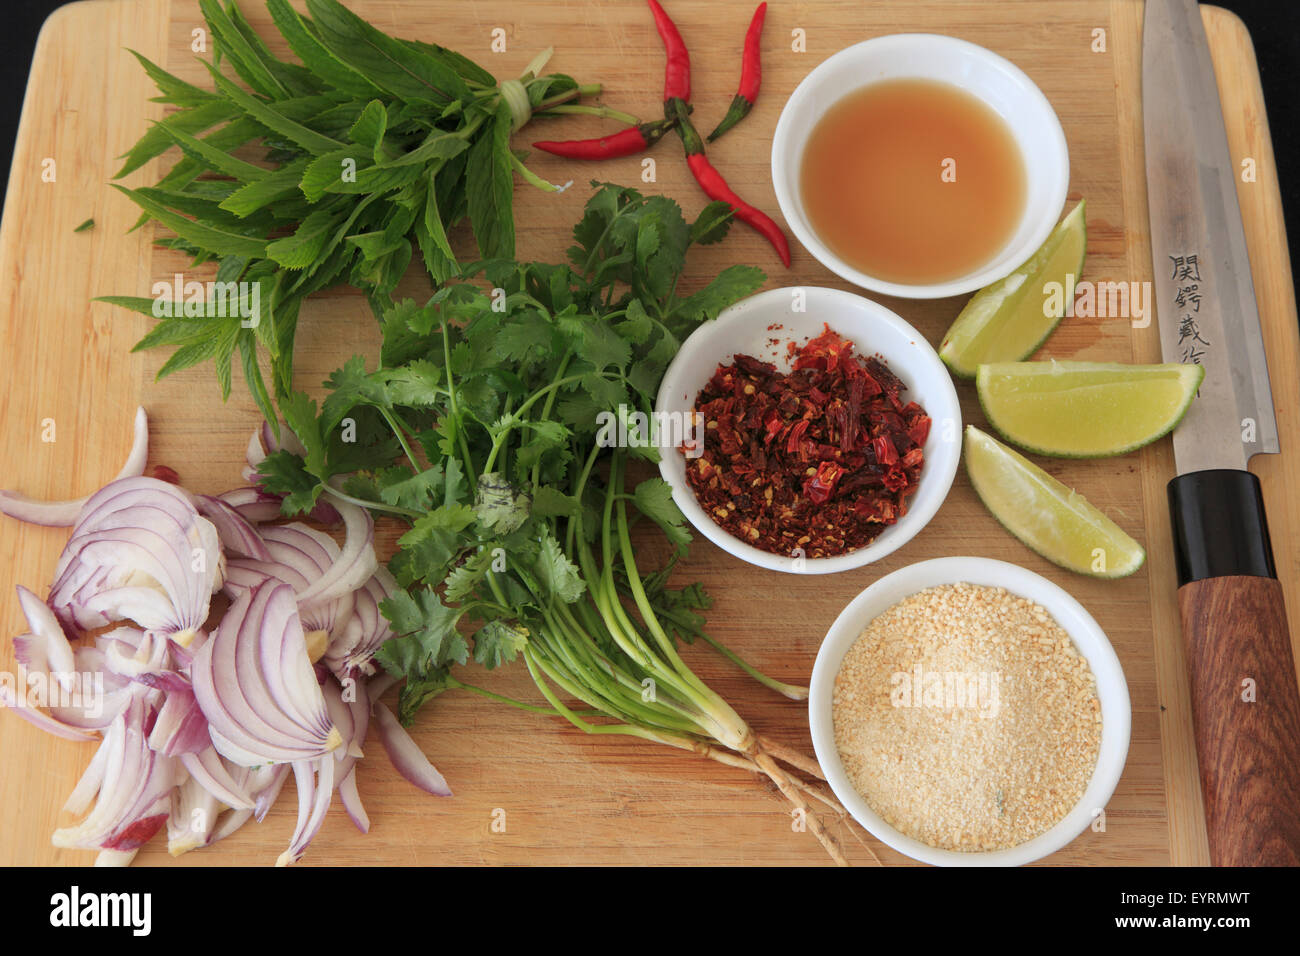 Laotian food, larb, ingredients, seasoning, herbs, spices, - Stock Image